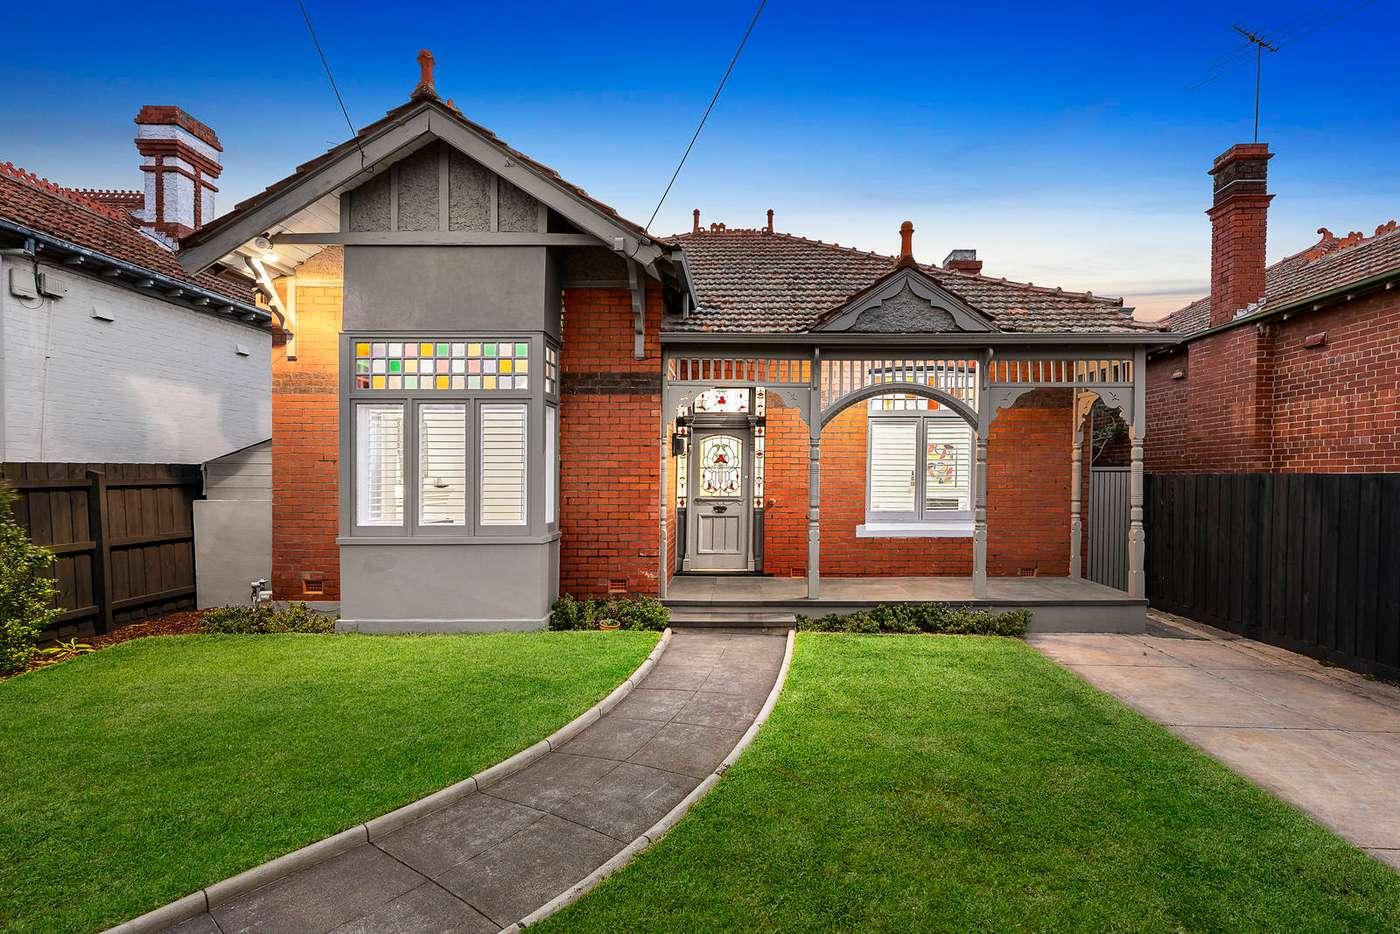 Main view of Homely house listing, 427 Inkerman Street, St Kilda East, VIC 3183